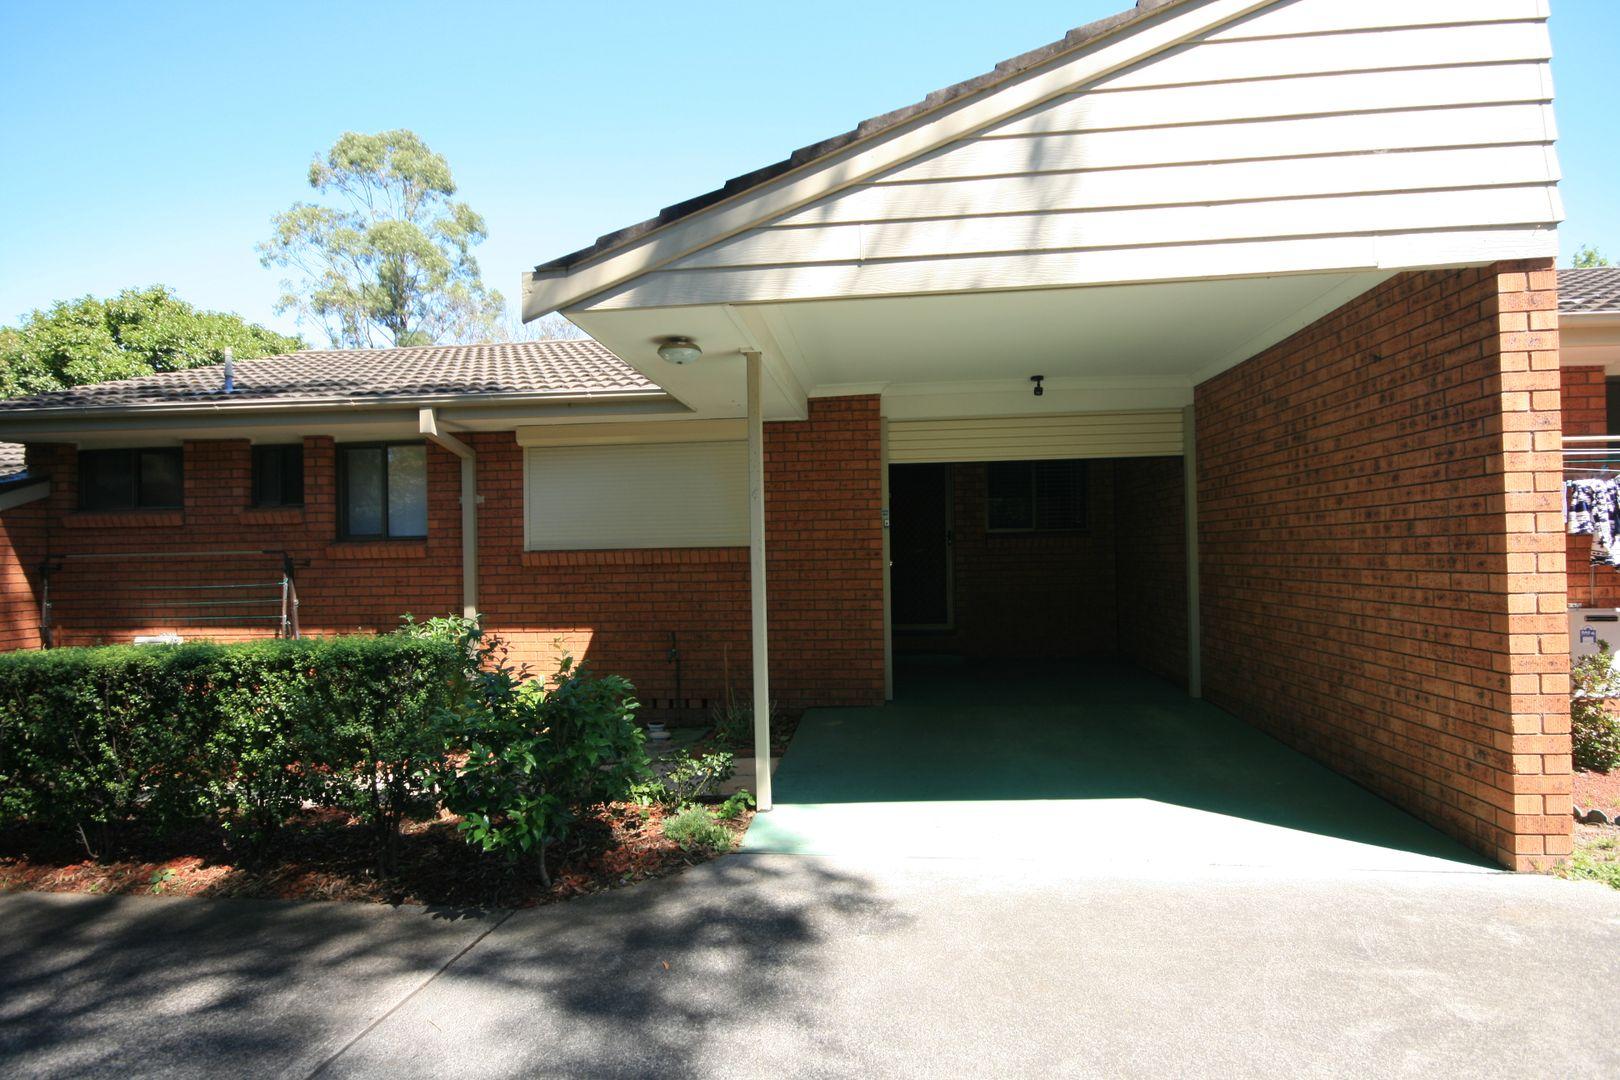 4/11 Oxley  Drive, Bowral NSW 2576, Image 1